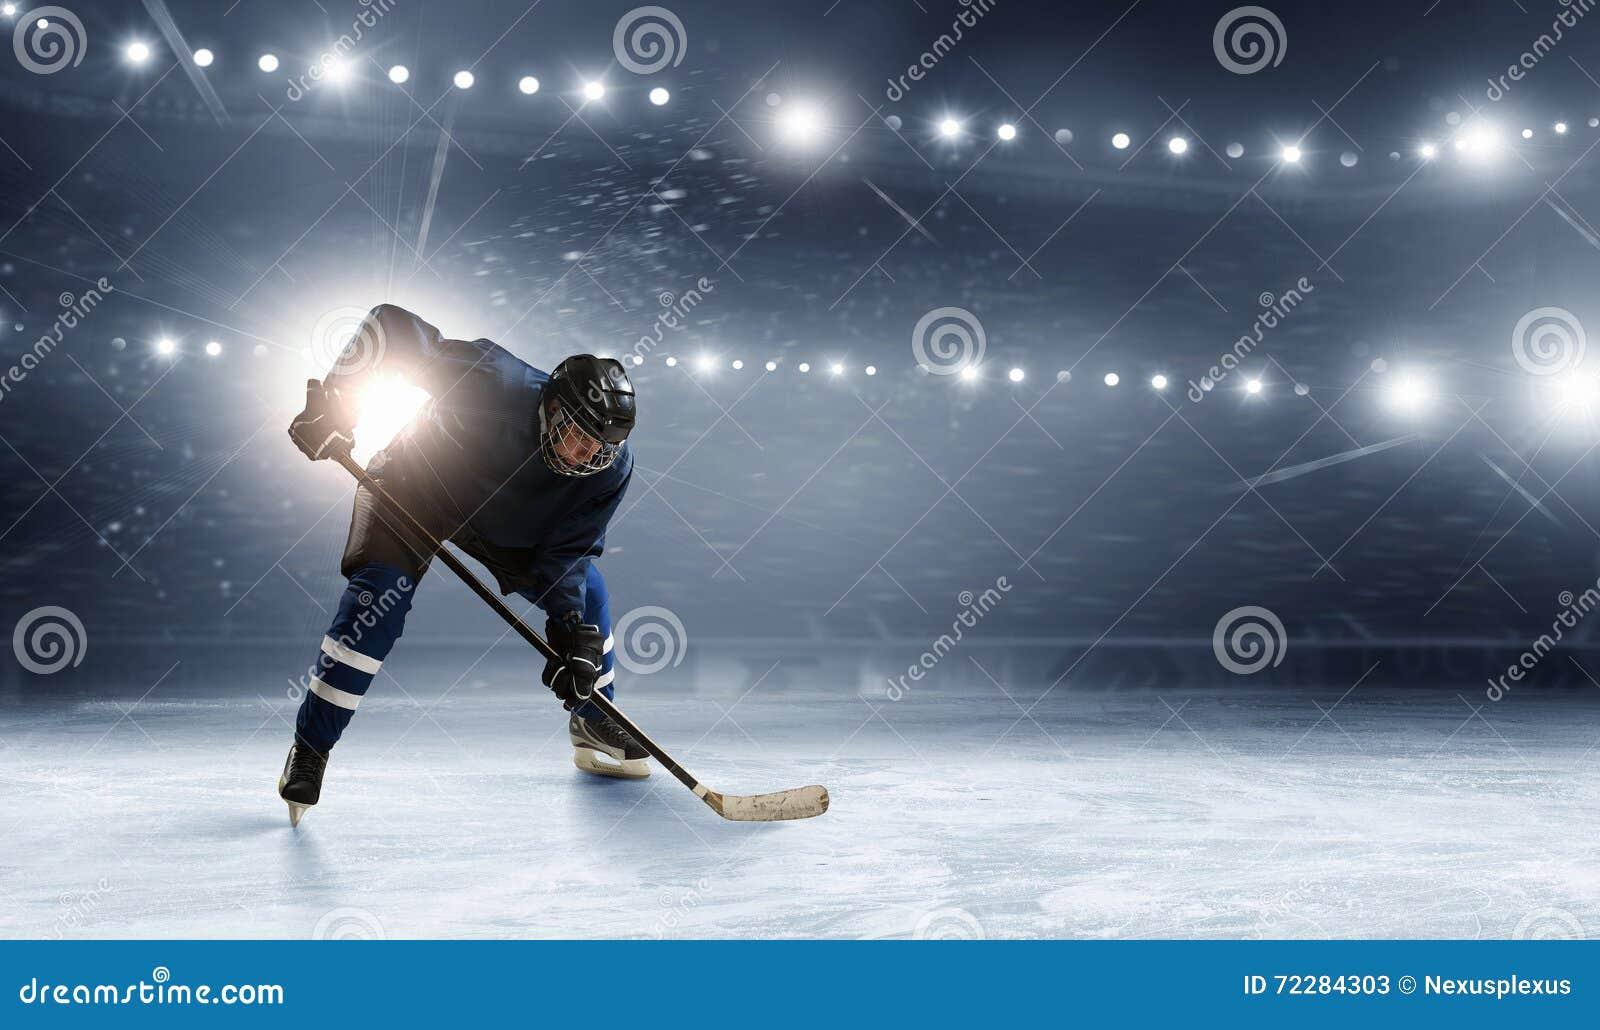 Ice hockey player at rink